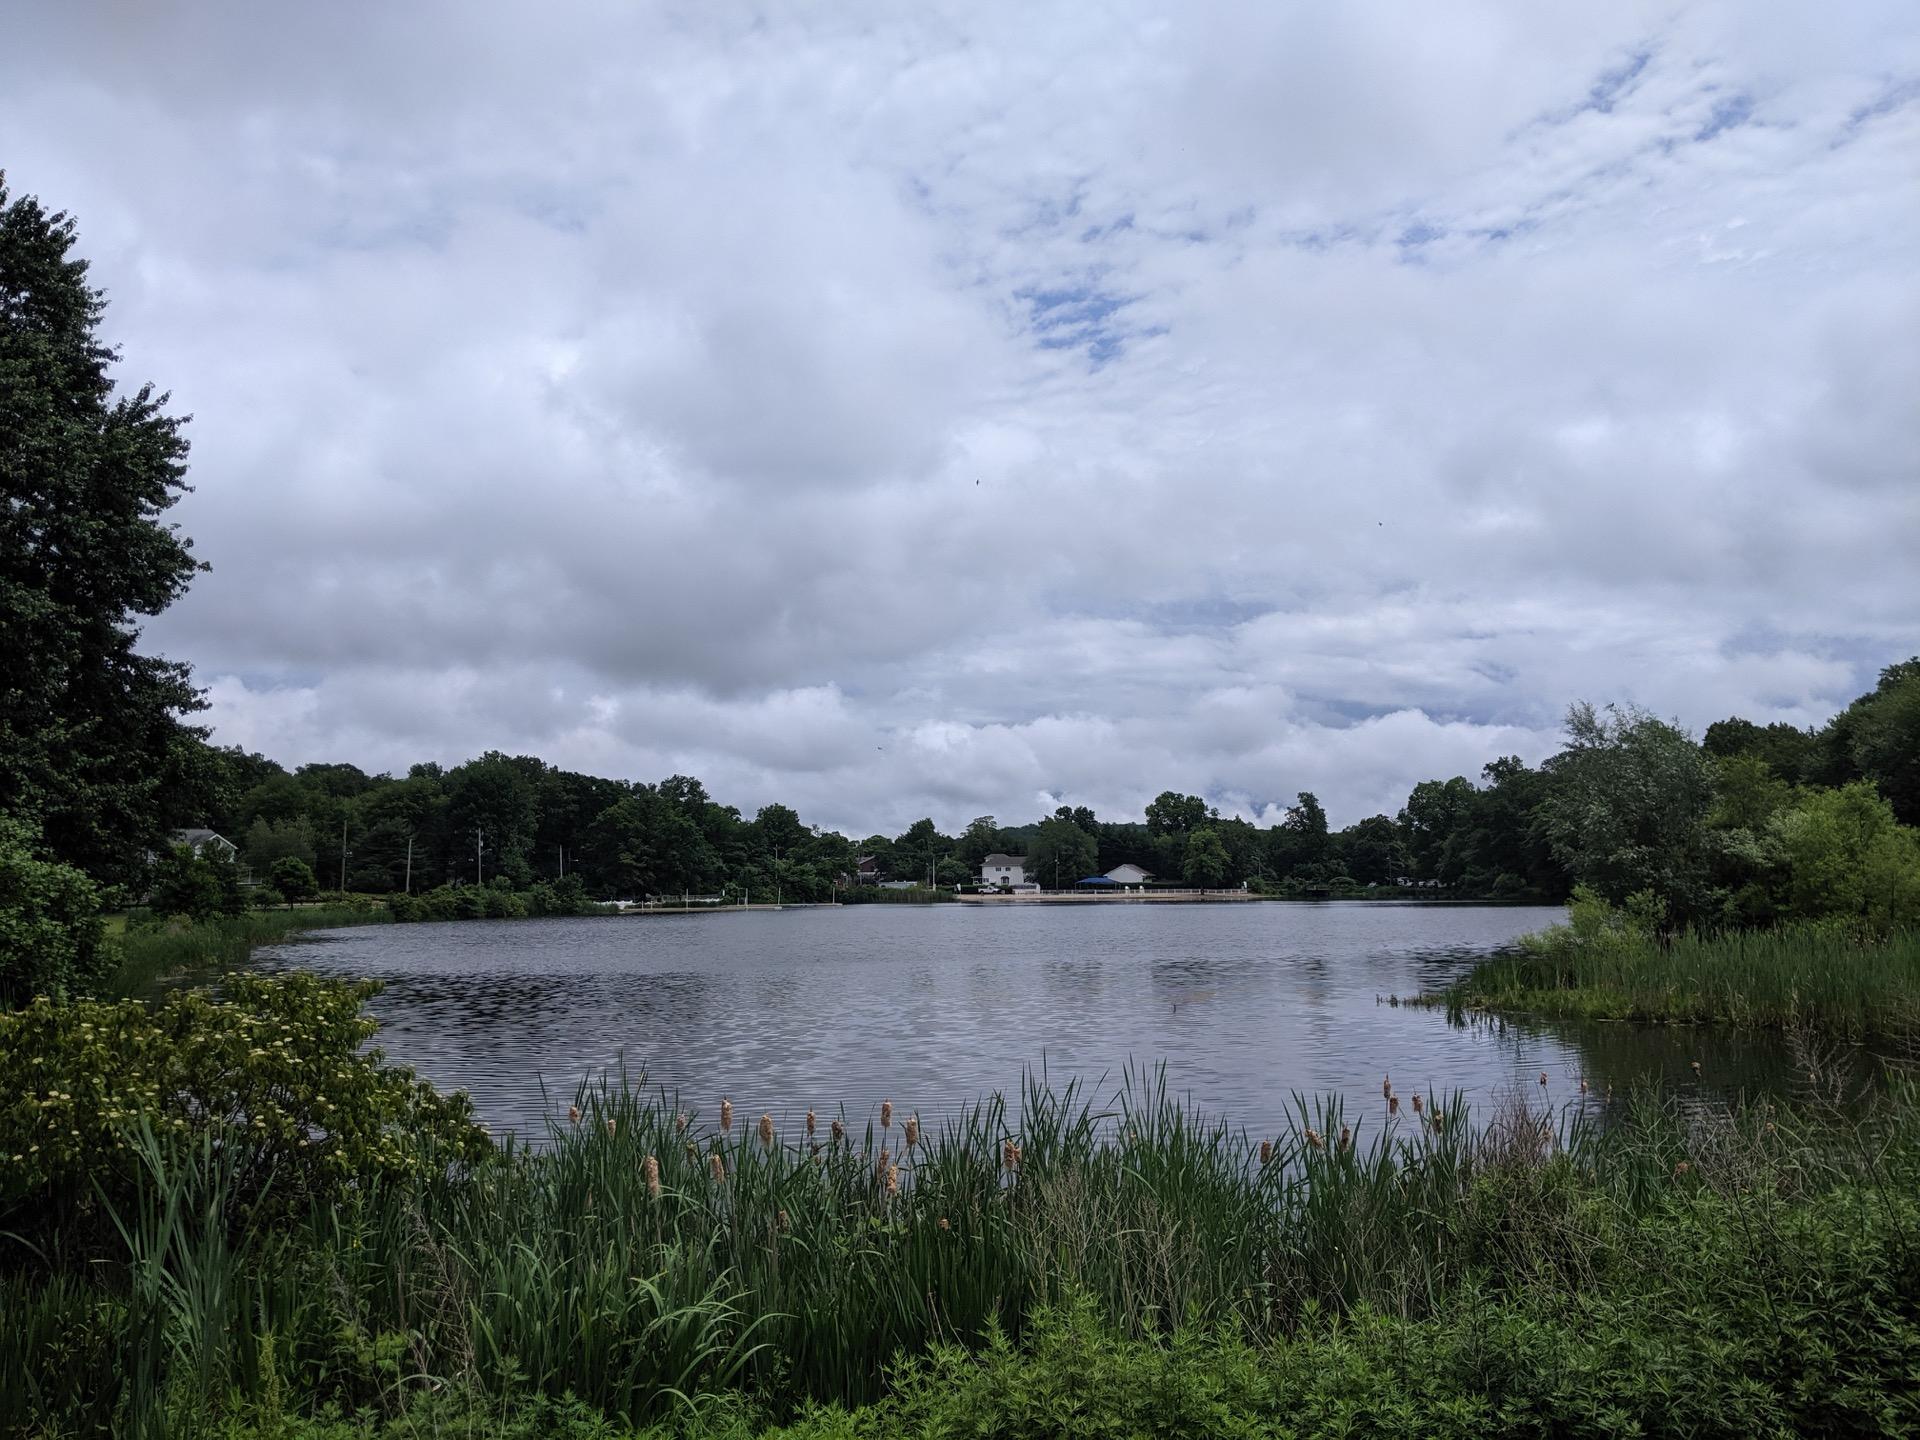 Google Pixel 3a XL Camera Review Landscape Pond